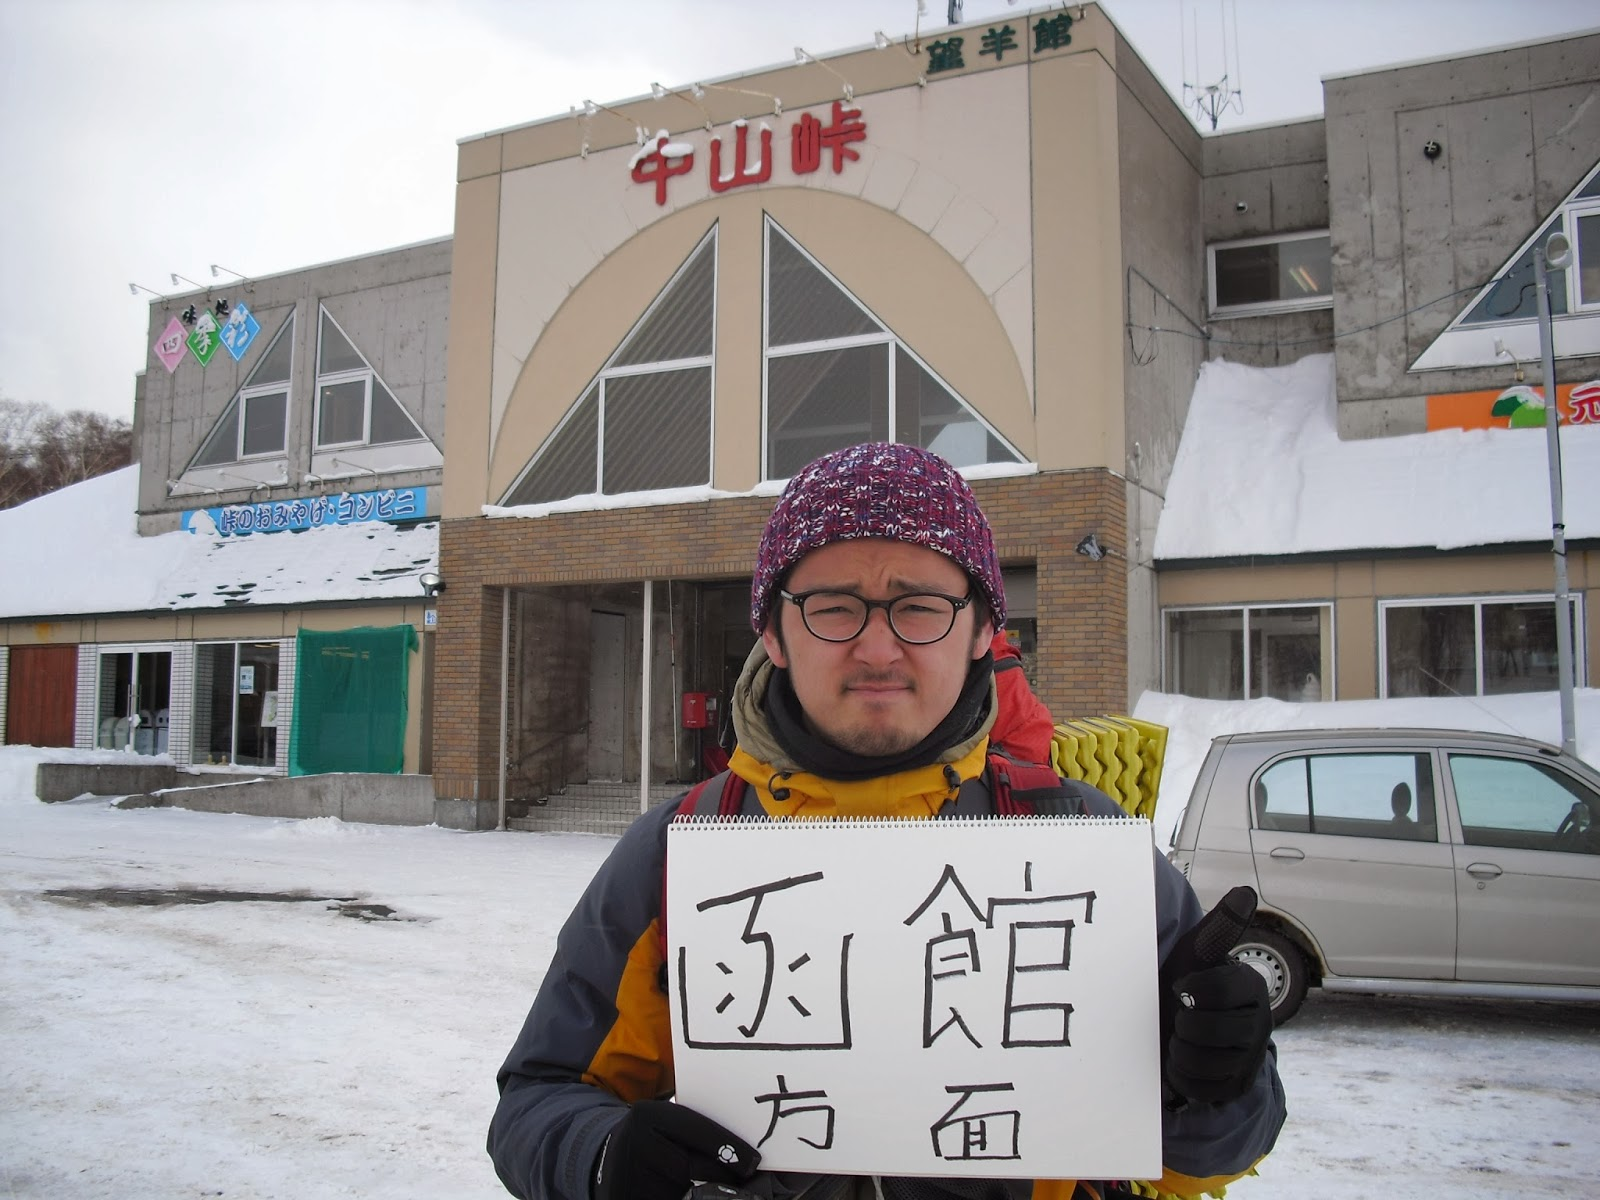 http://yasube-hitchhike.blogspot.jp/2014/03/day1.html